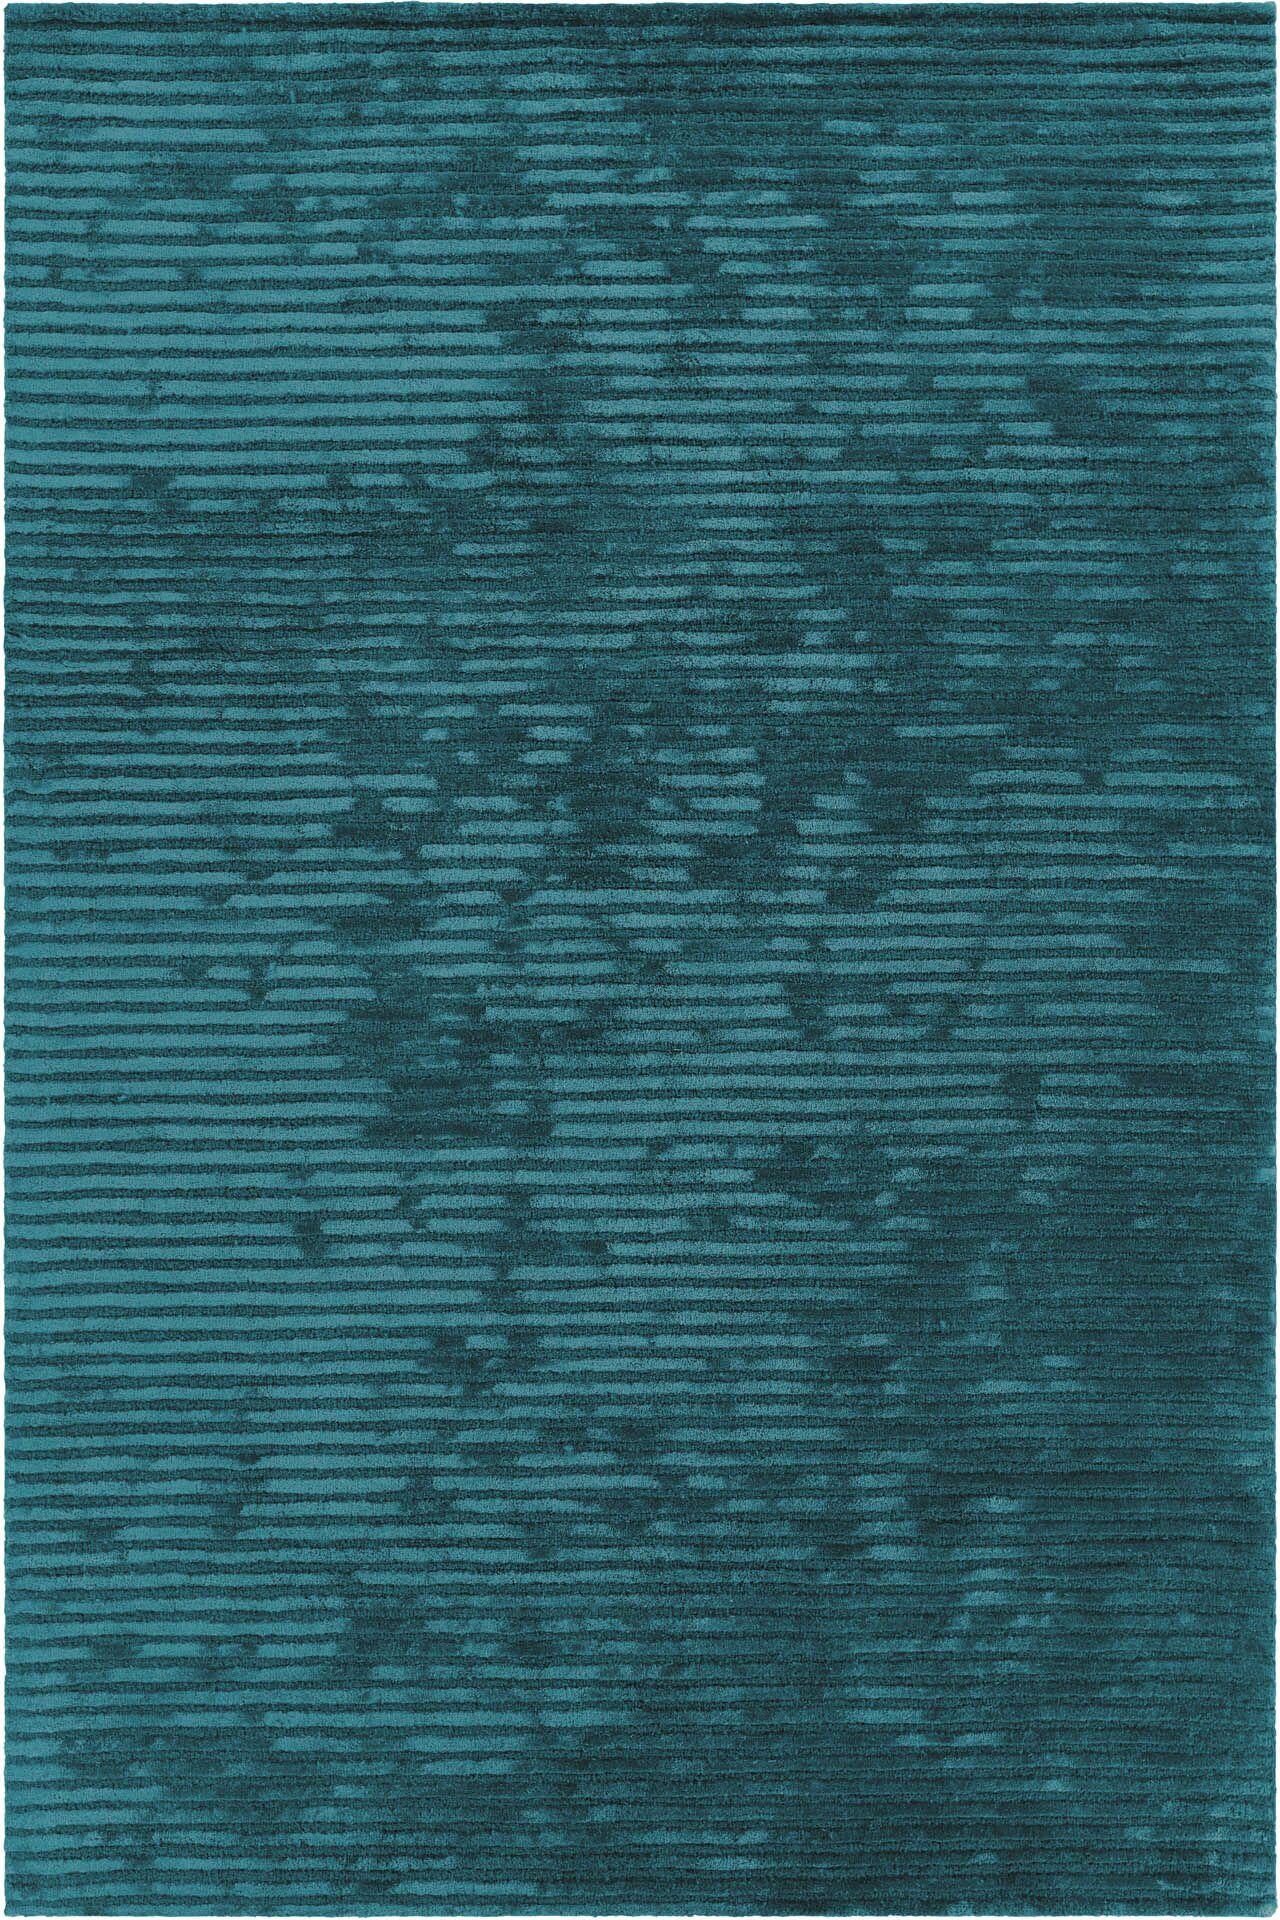 Nathen Textured Striped Blue Area Rug Rug Size: 7'9